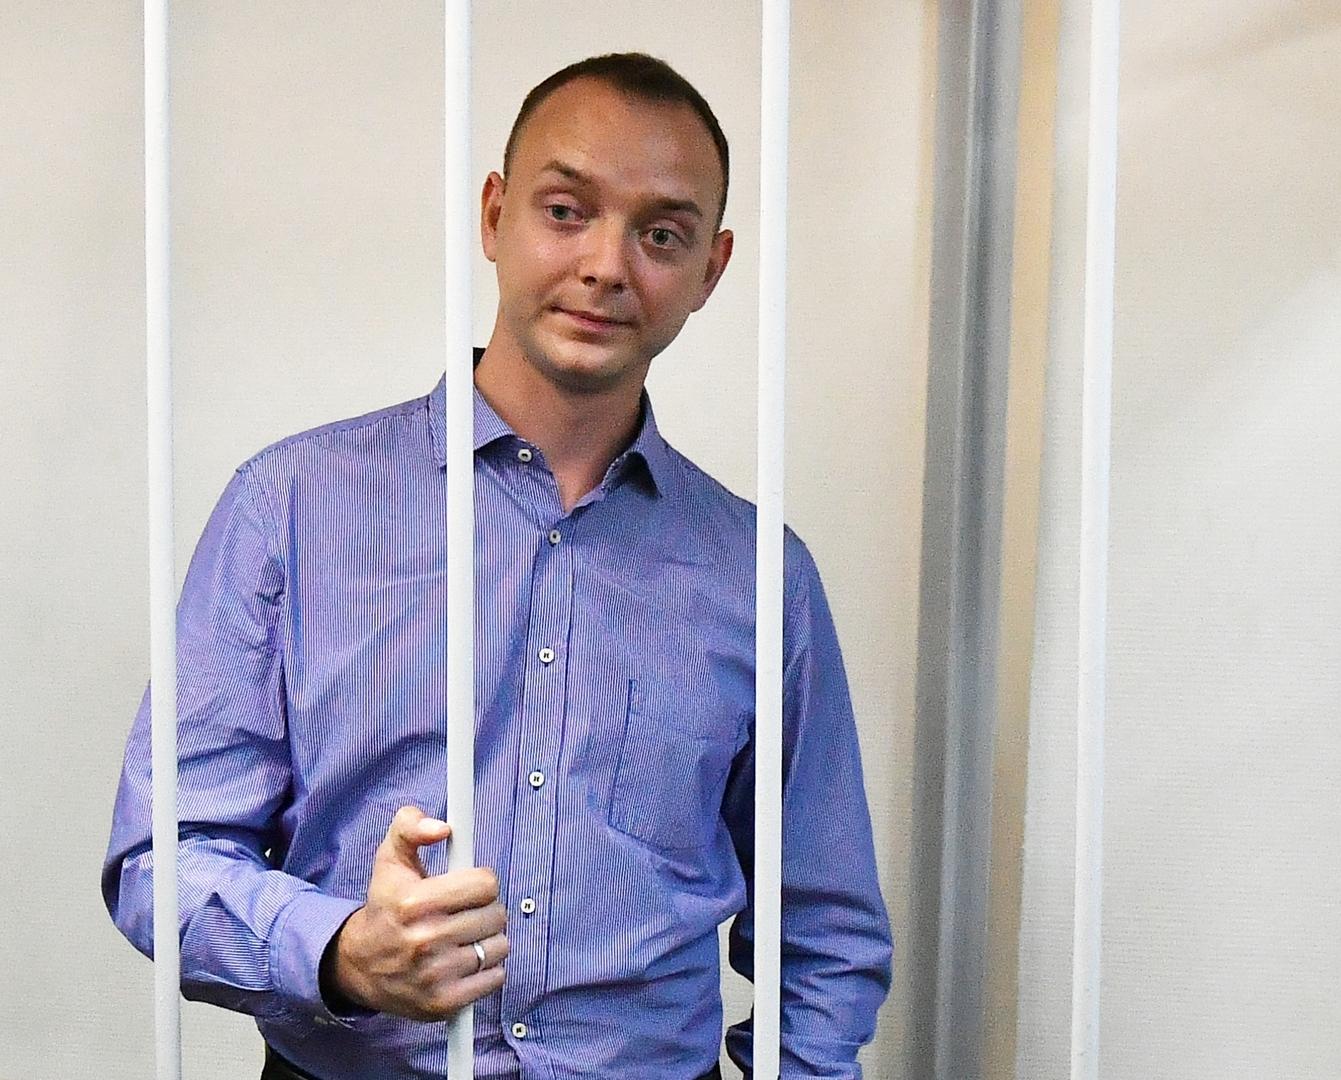 إيفان سافرونوف مستشار مؤسسة